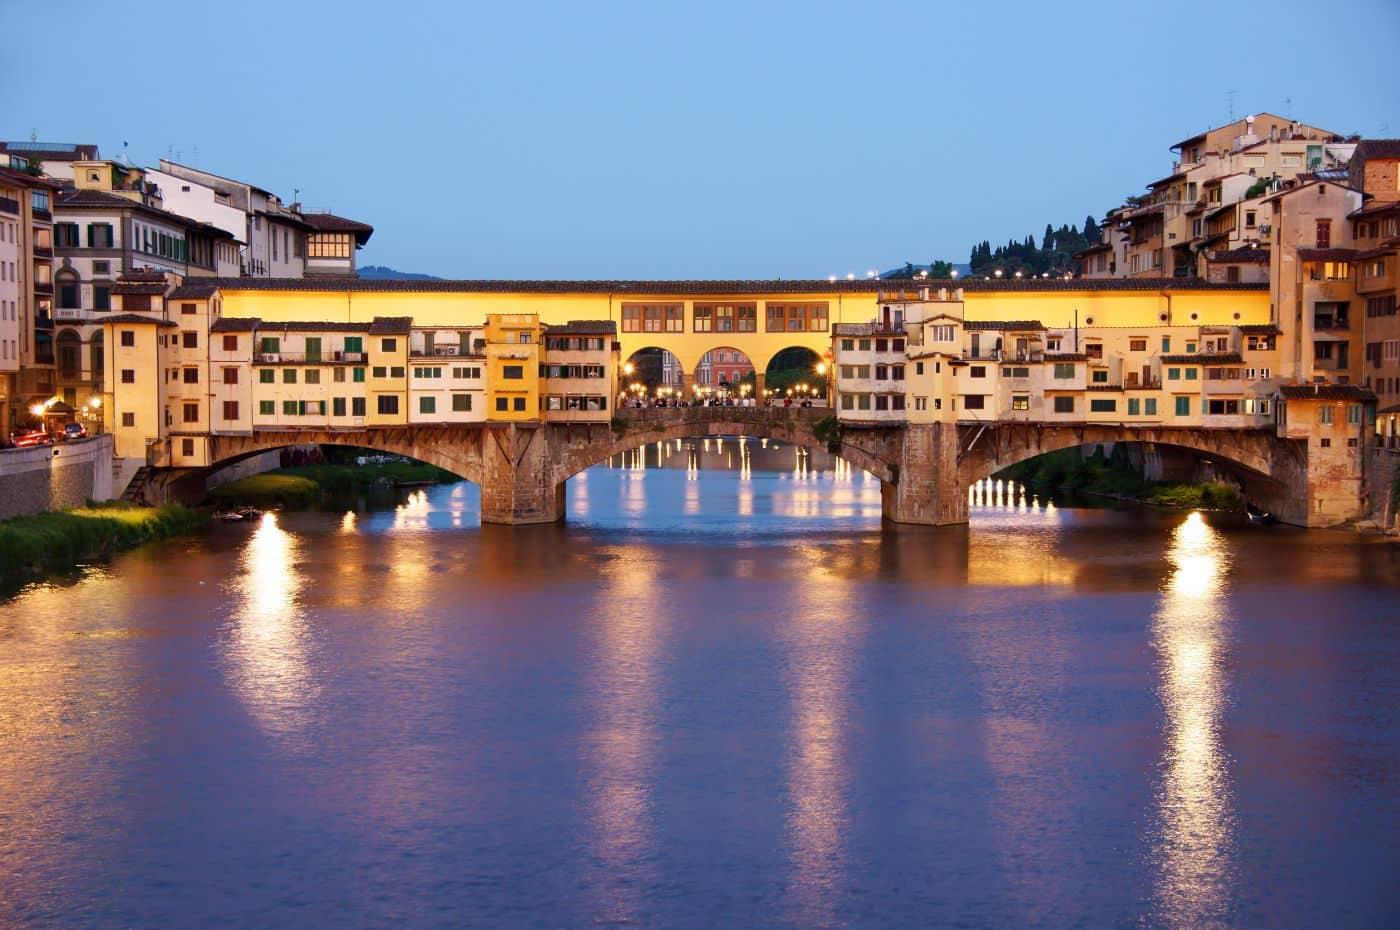 20210309141048217-08-14439Ponte_Vecchio_Firenze.jpg